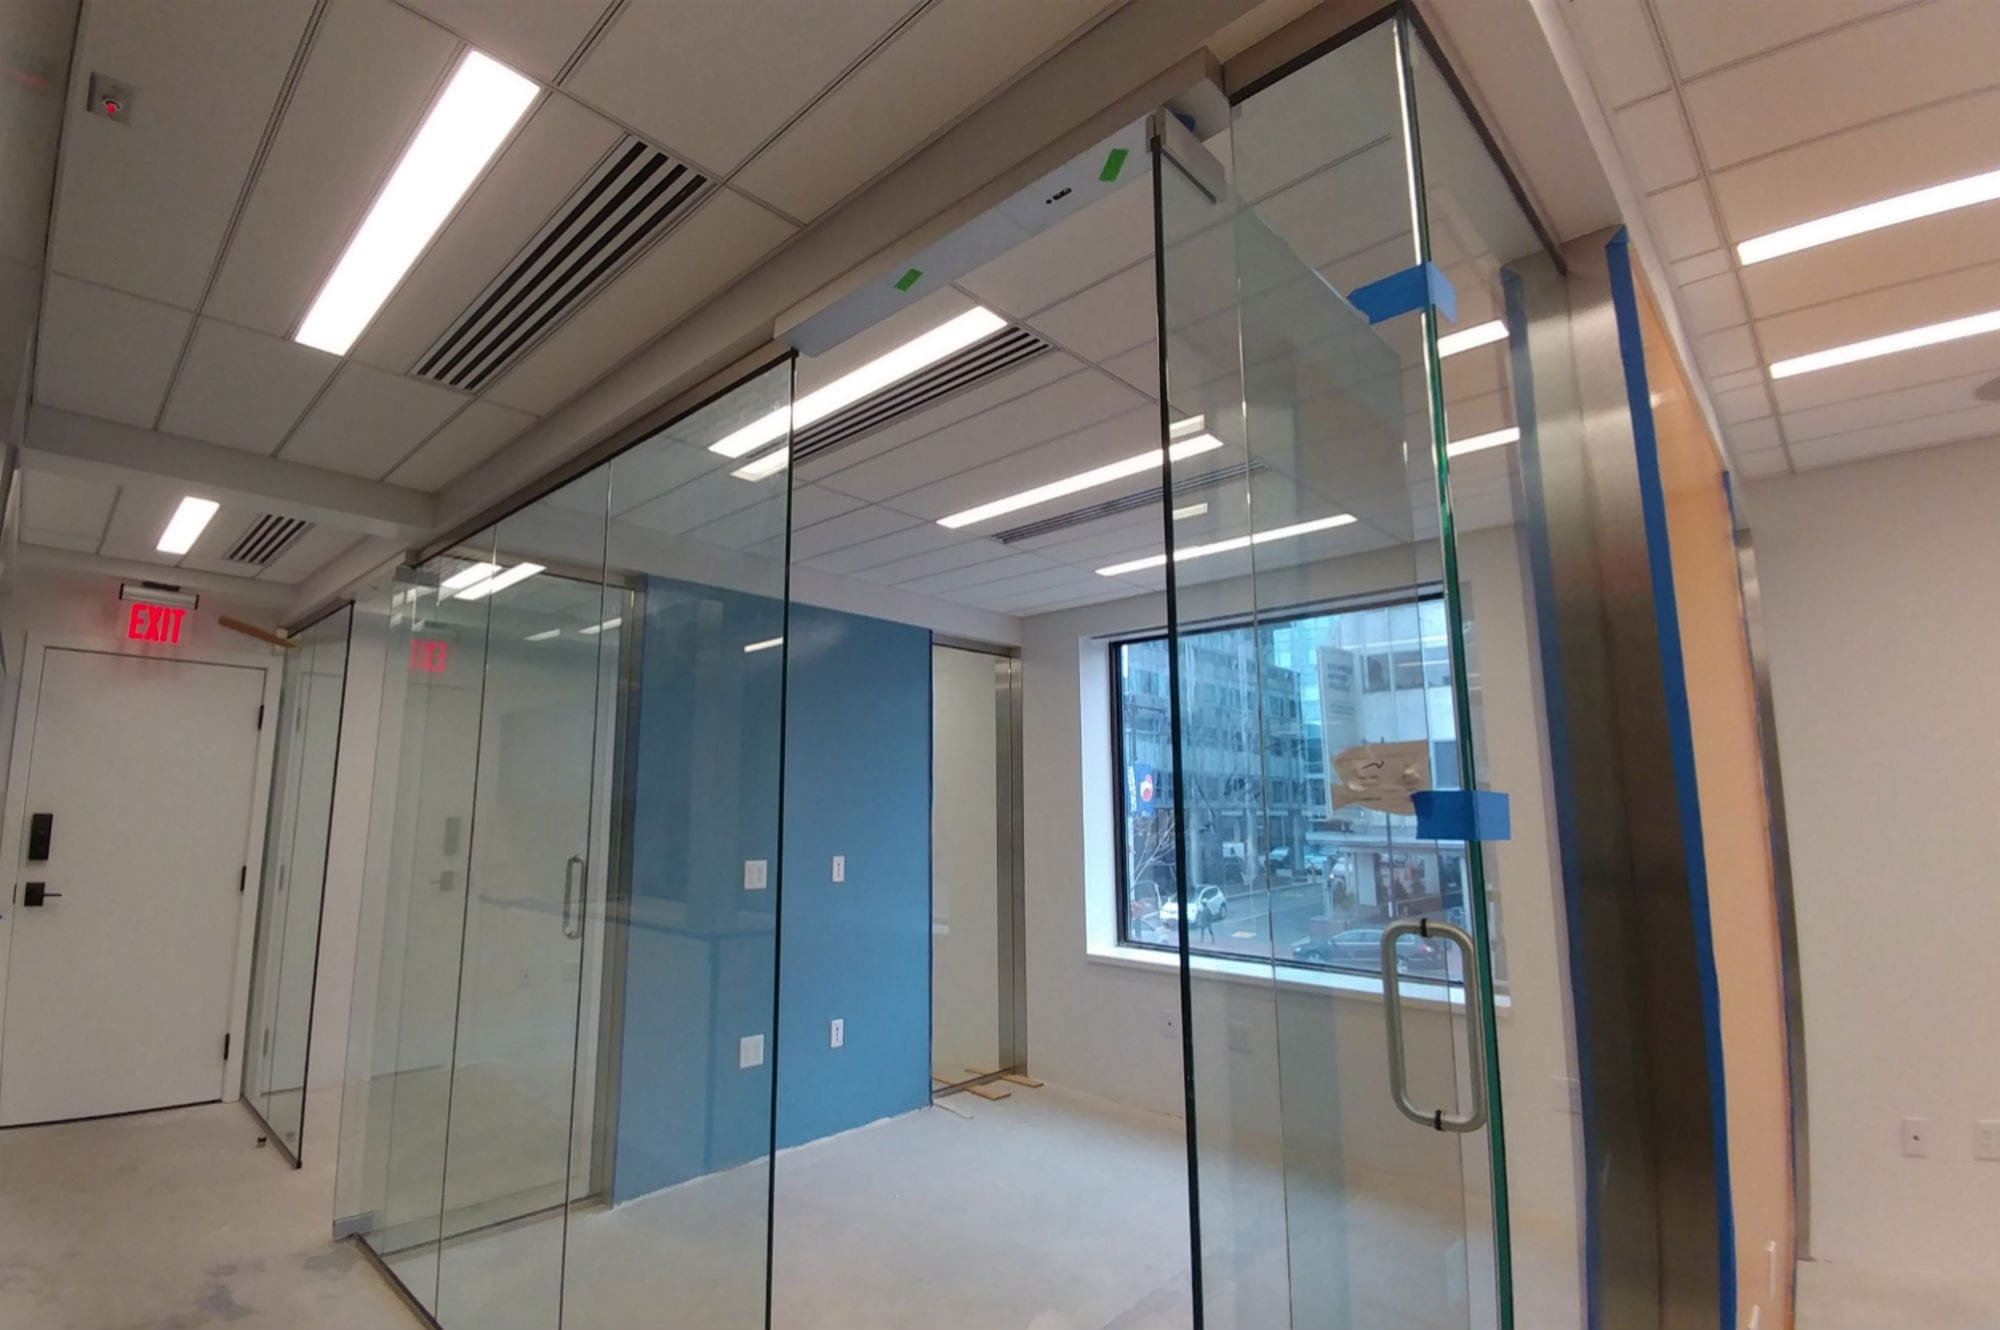 Cambridge St. Boston – Commercial  HVAC Project